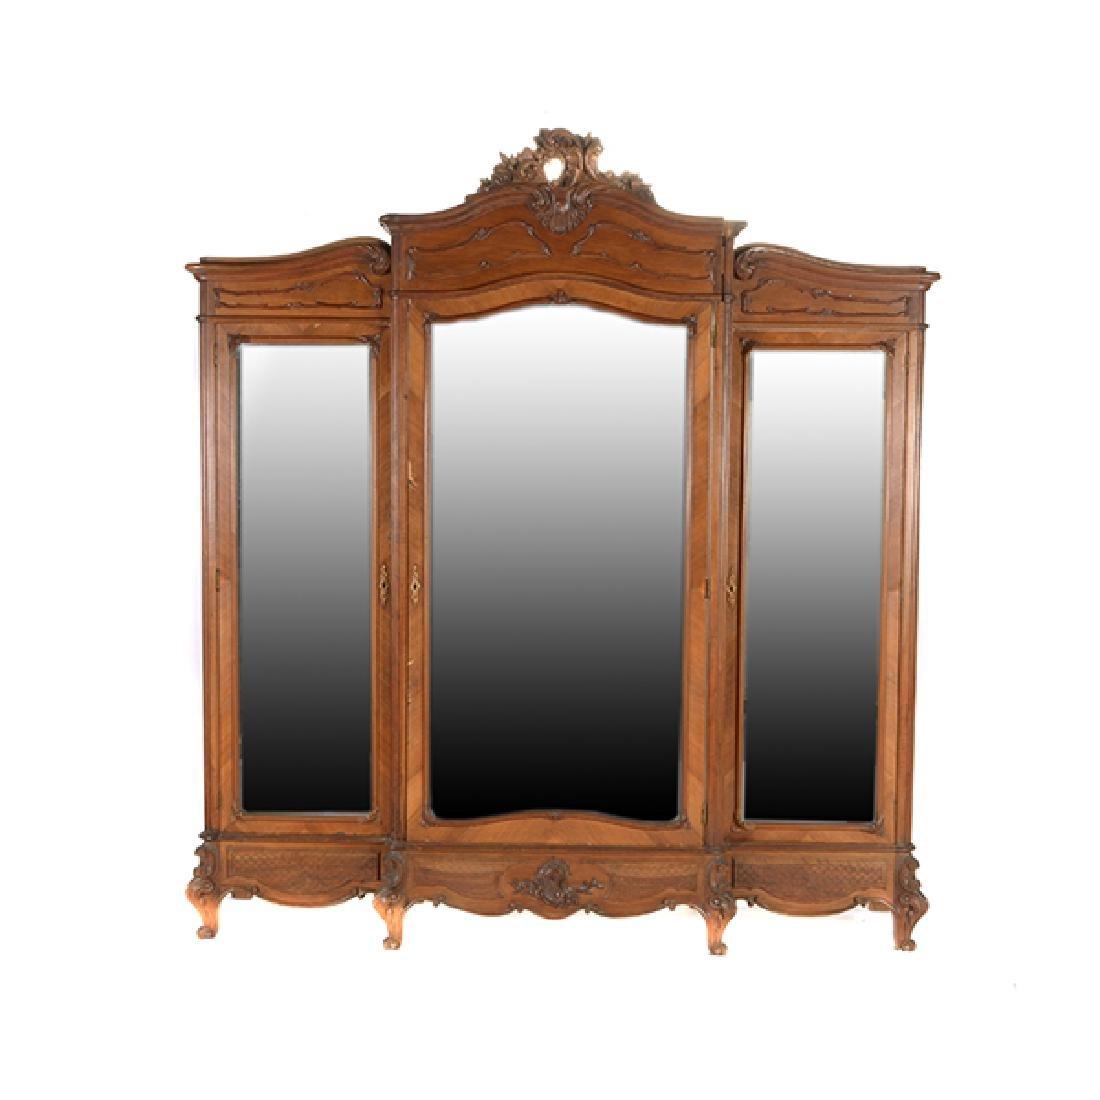 Louis XV Style Walnut Triple Mirrored Armoire